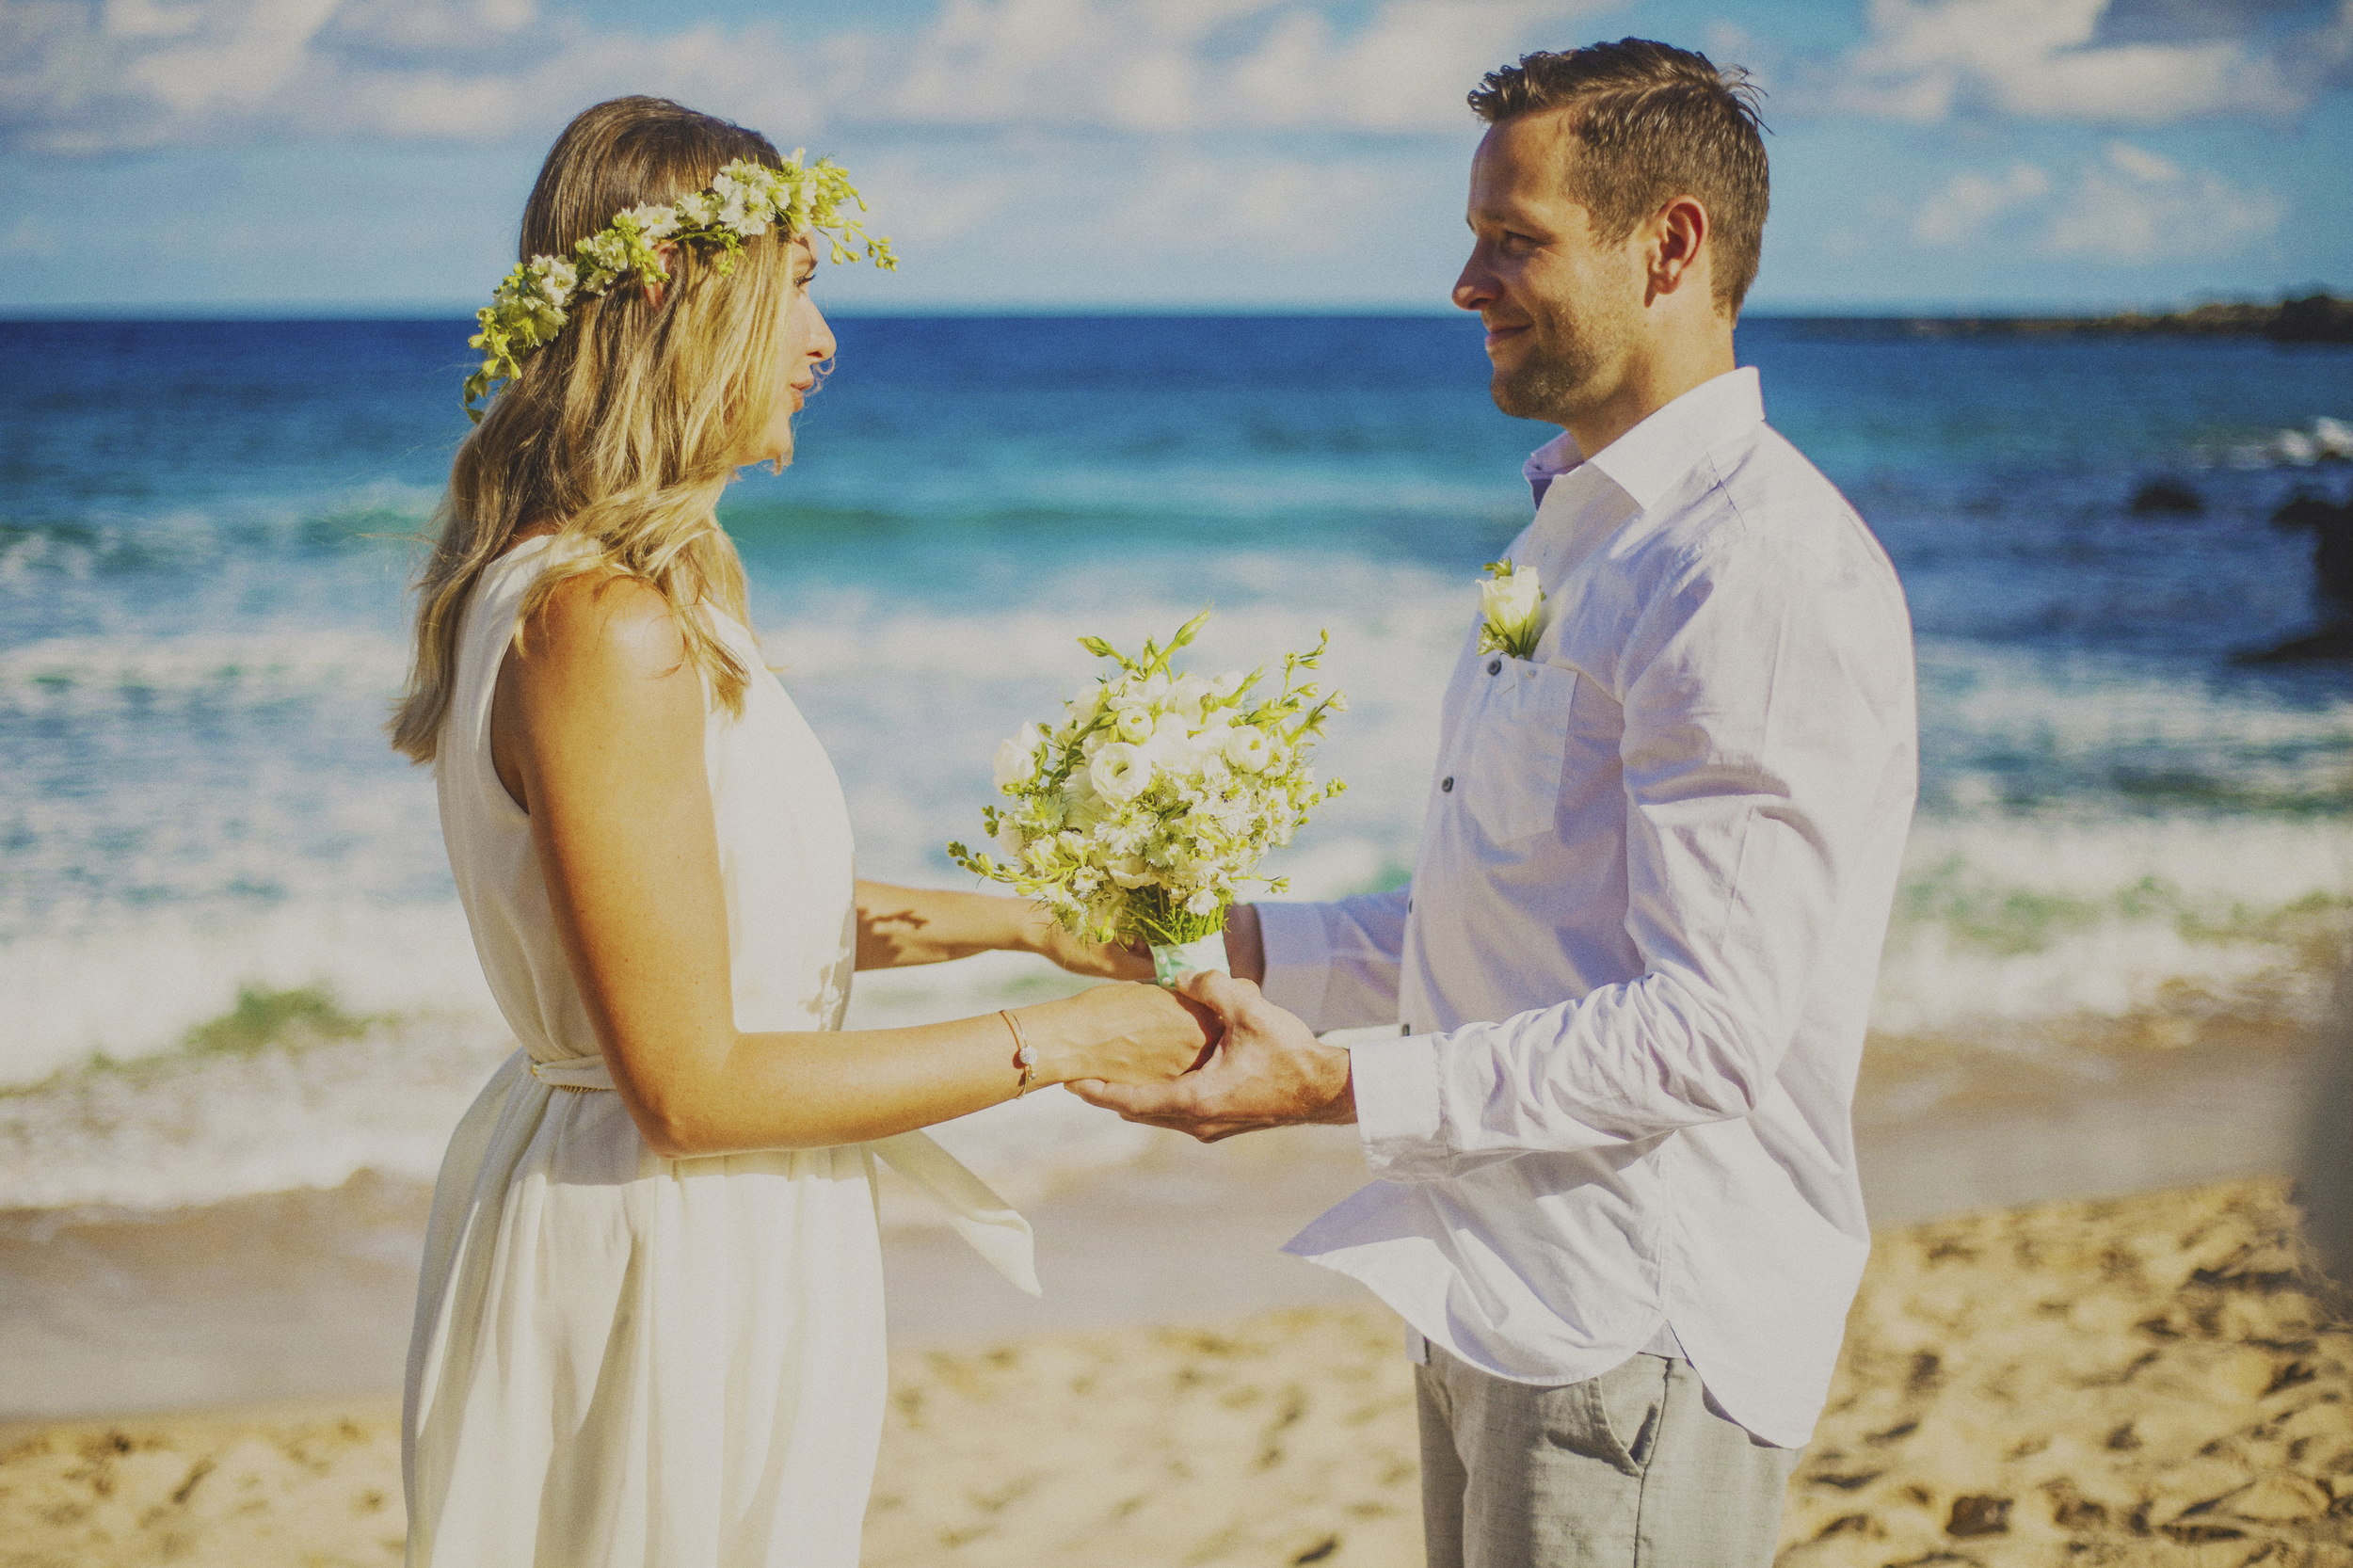 angie-diaz-photography-maui-elopement-oneloa-ironwoods-beach-2.jpg